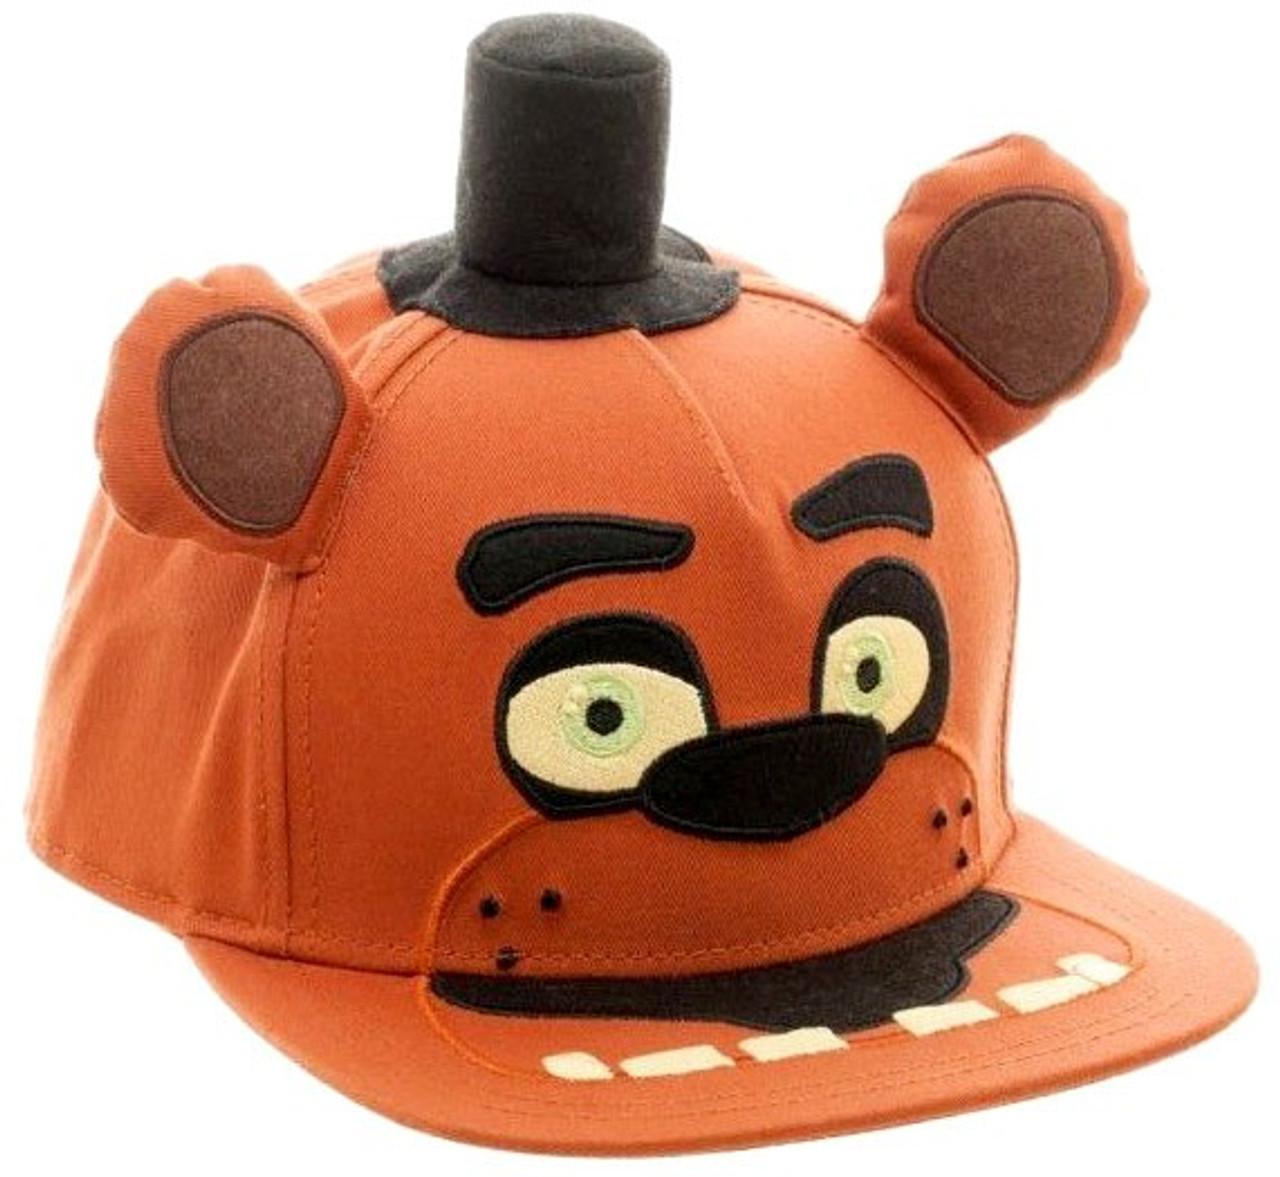 dd56b3d5e73622 Five Nights at Freddys Big Face Plush Snapback Baseball Cap Bioworld -  ToyWiz